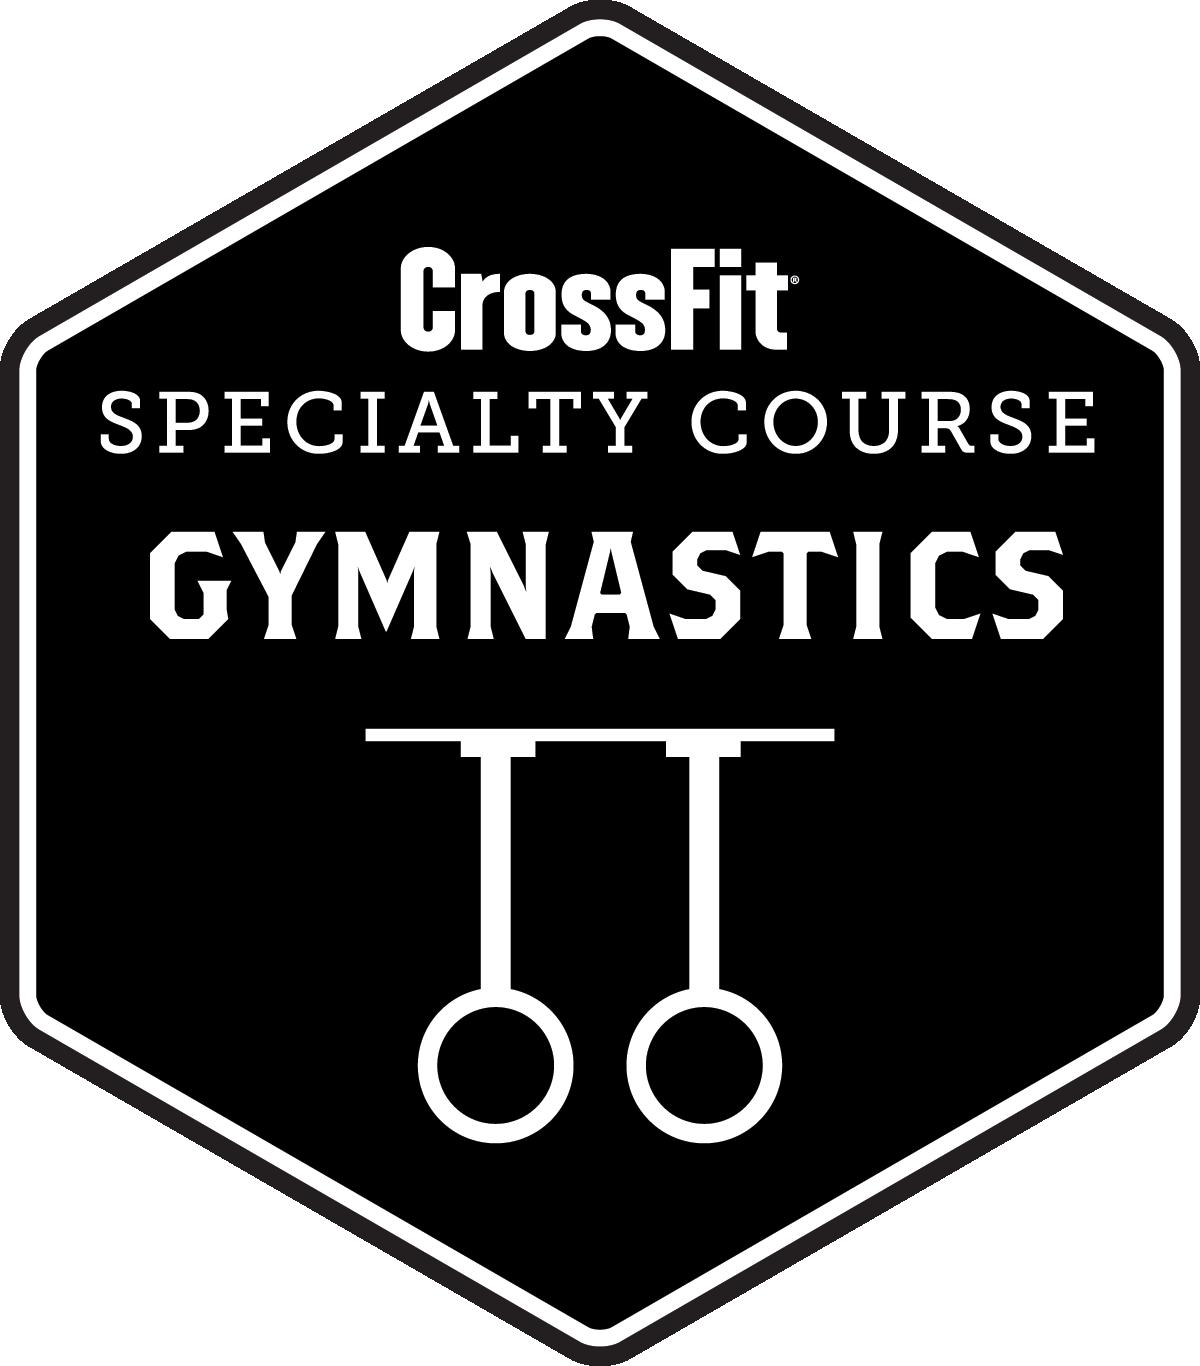 CrossFit Speciality Course Gymnastics